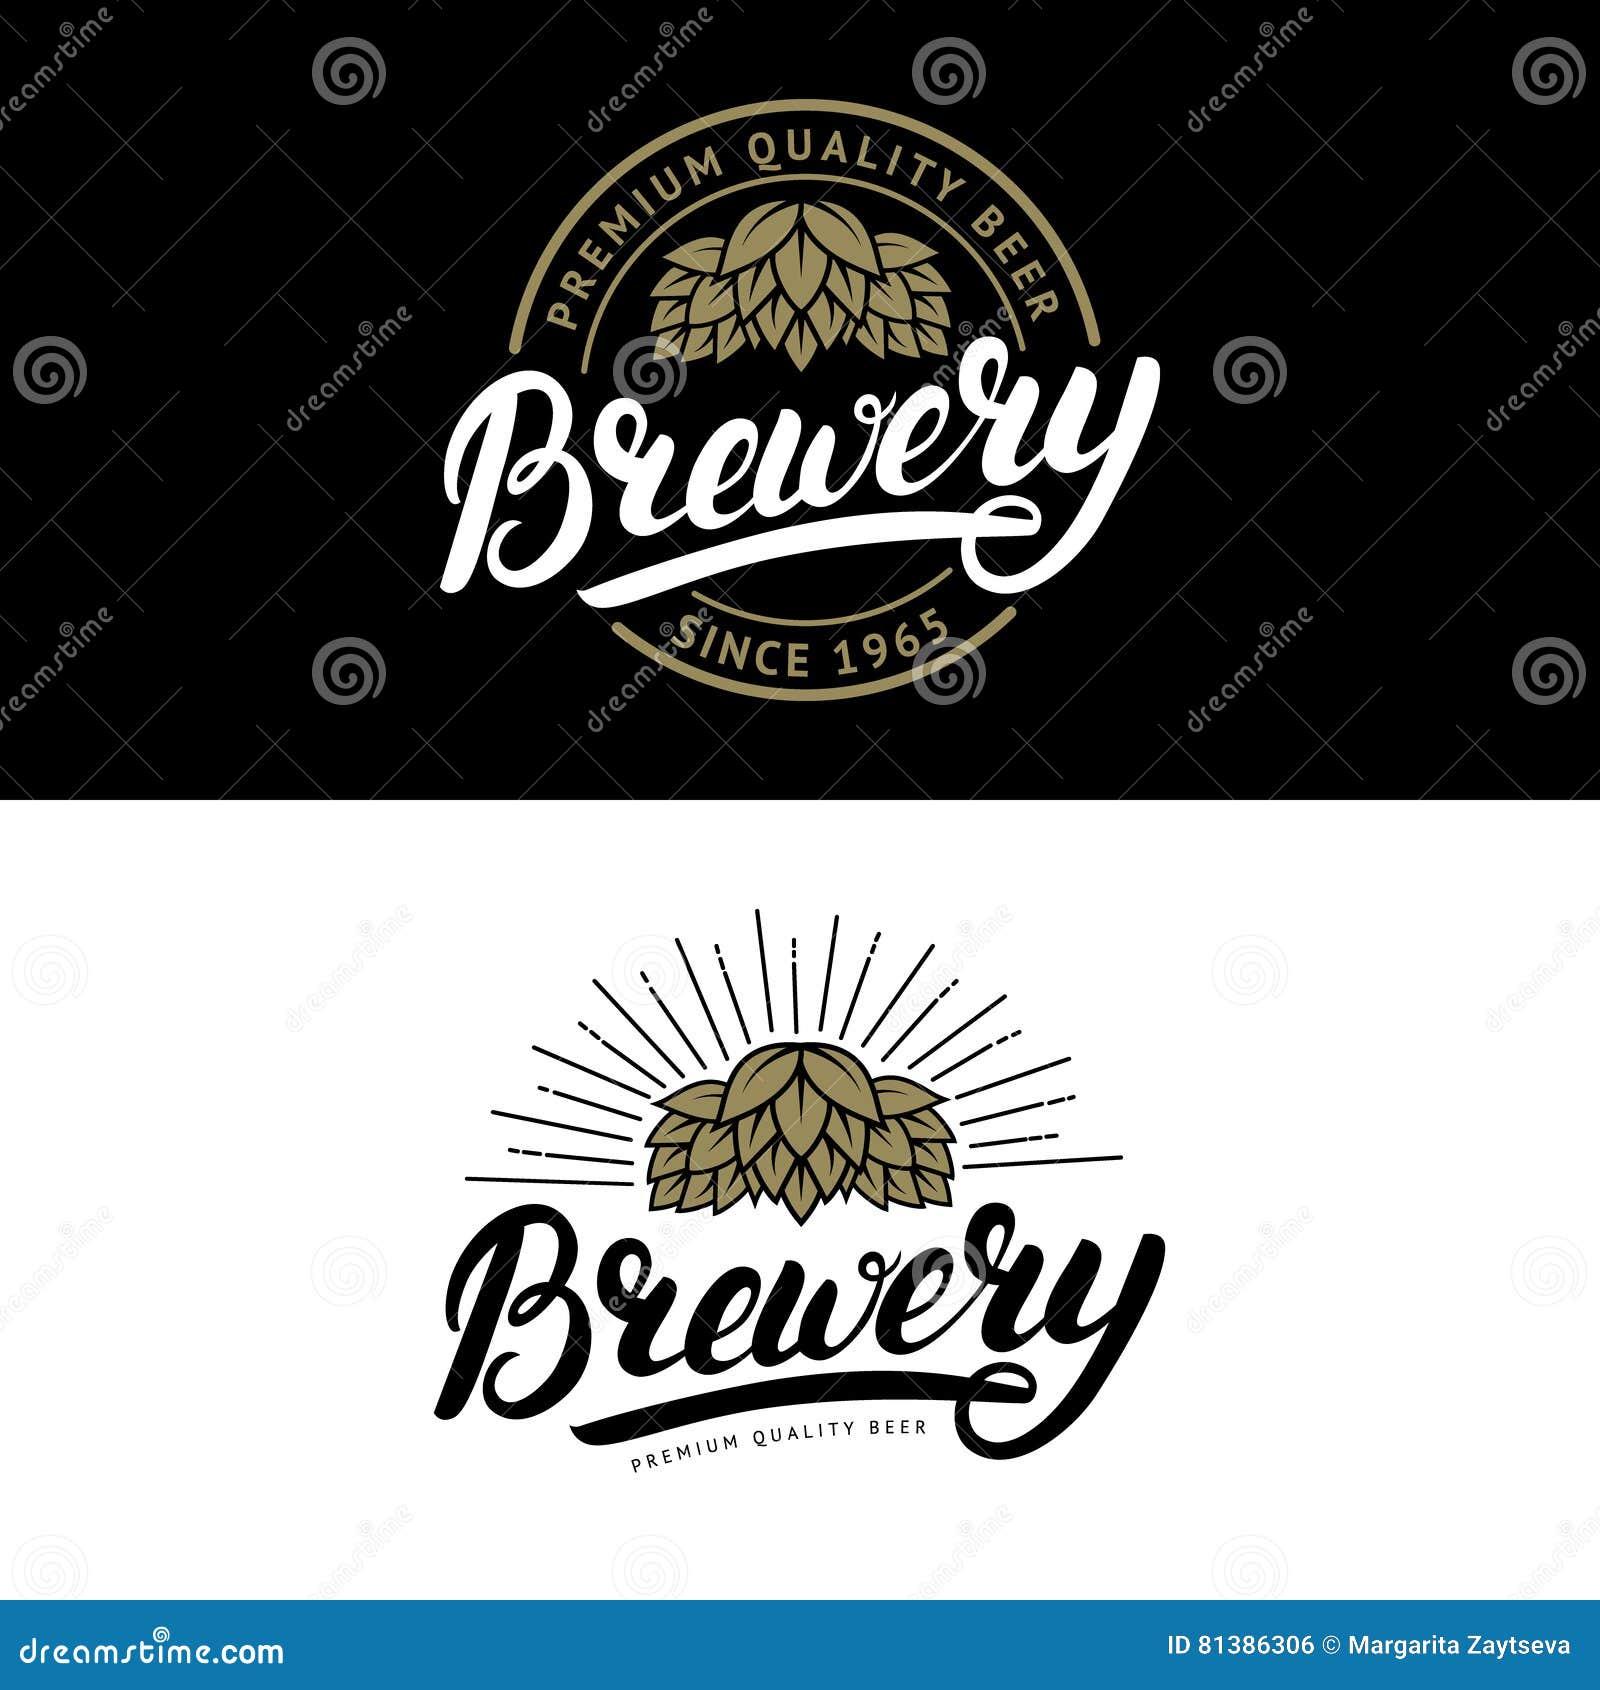 company badge template